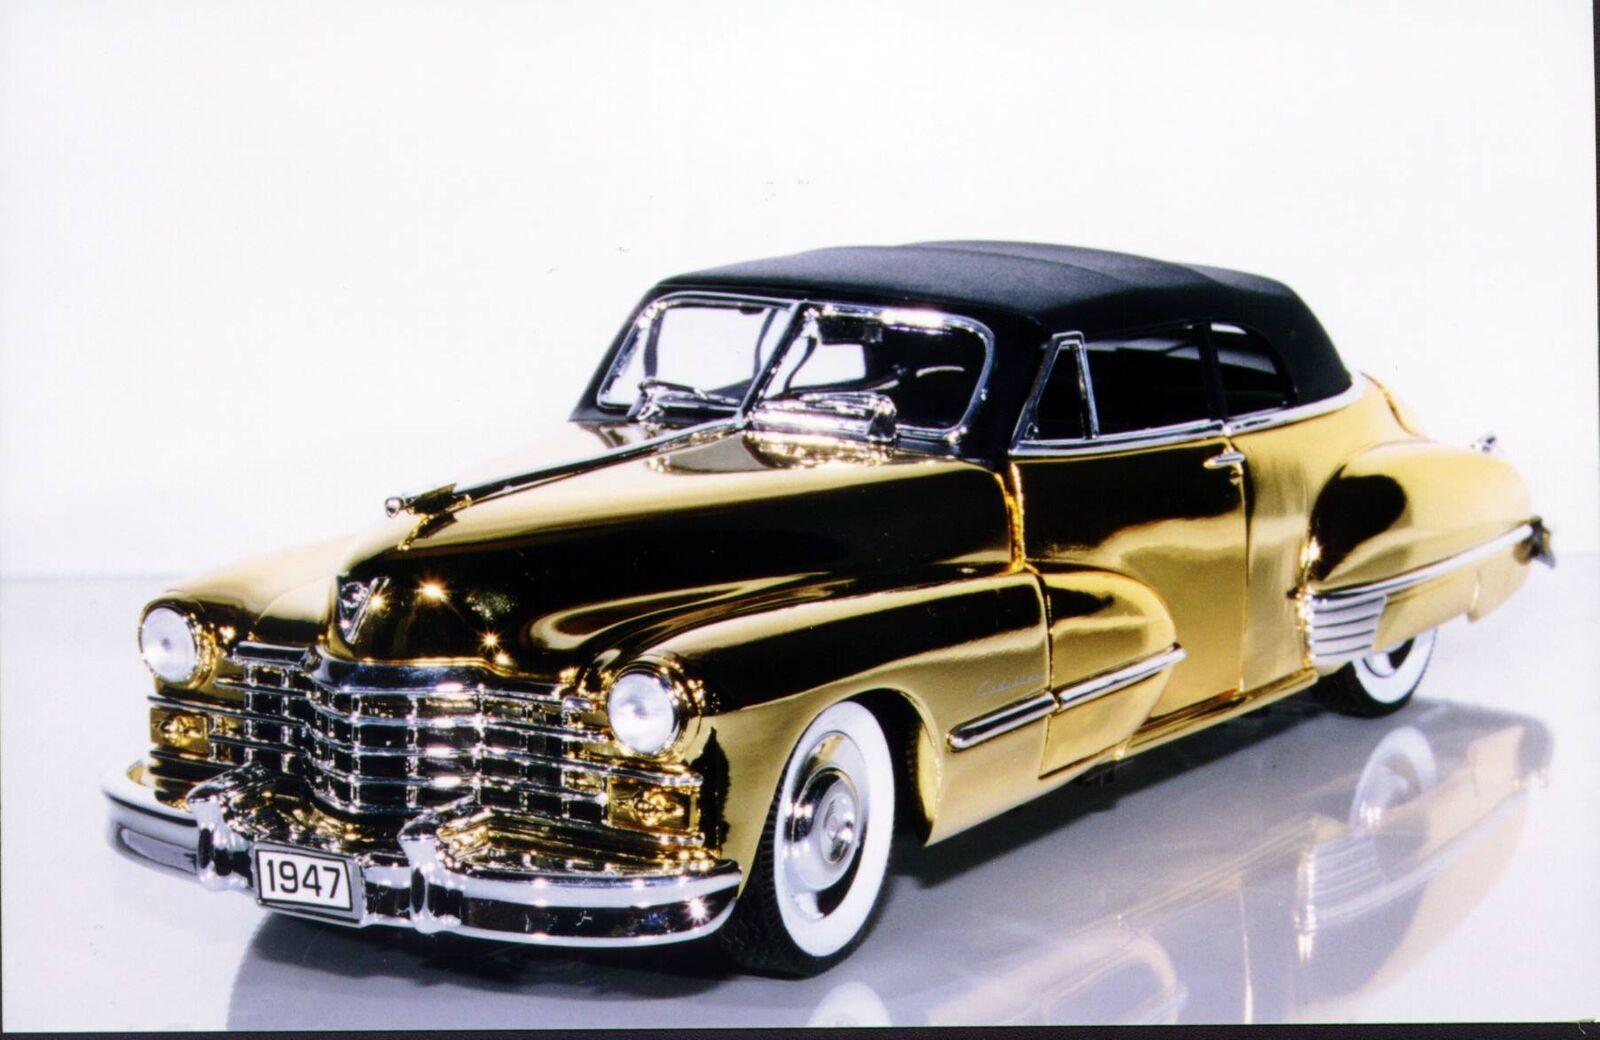 1 18 Cadillac'47 serie 62 ANSON chapado en oro 24k de Star Trek